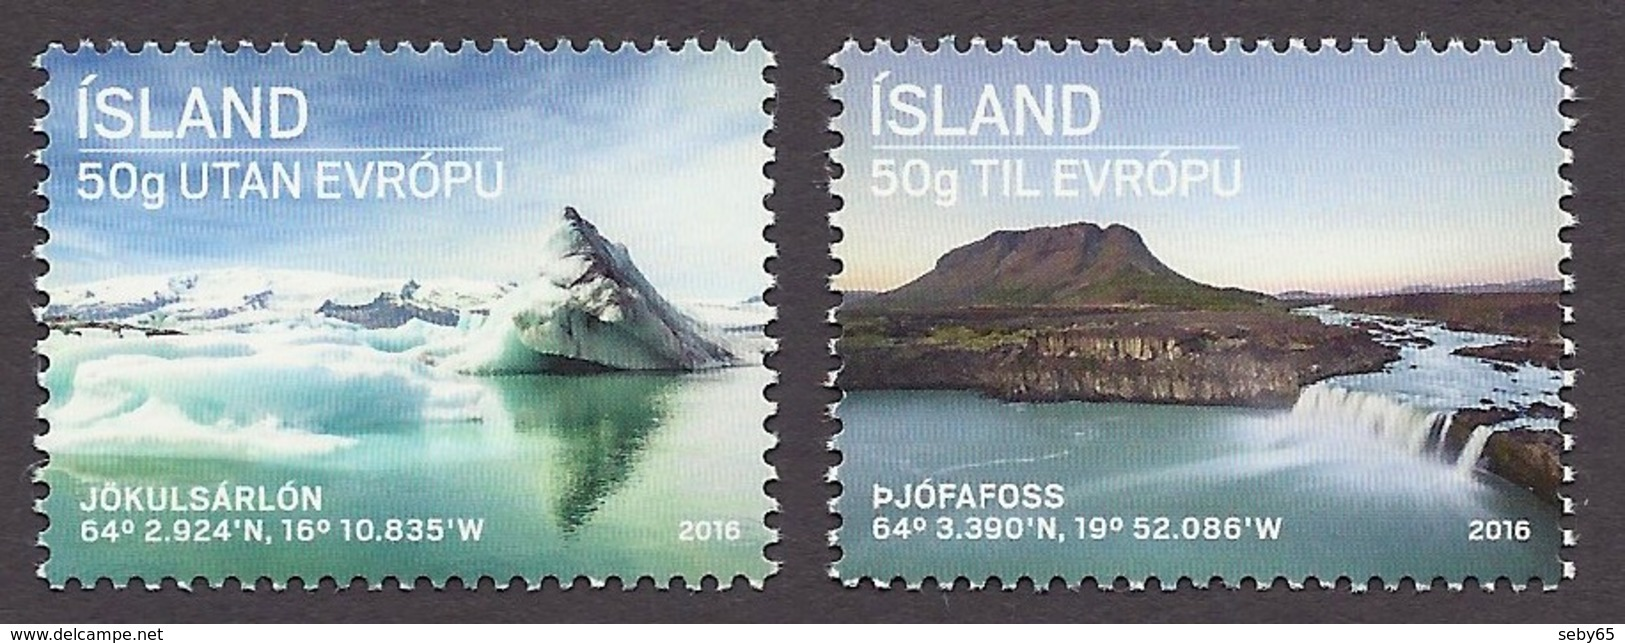 Iceland / Island 2016 - Tourism, Tourisme, Glacier Jokulsarlon, Waterfall Pjofafoss, Mountain View MNH - 1944-... Republique